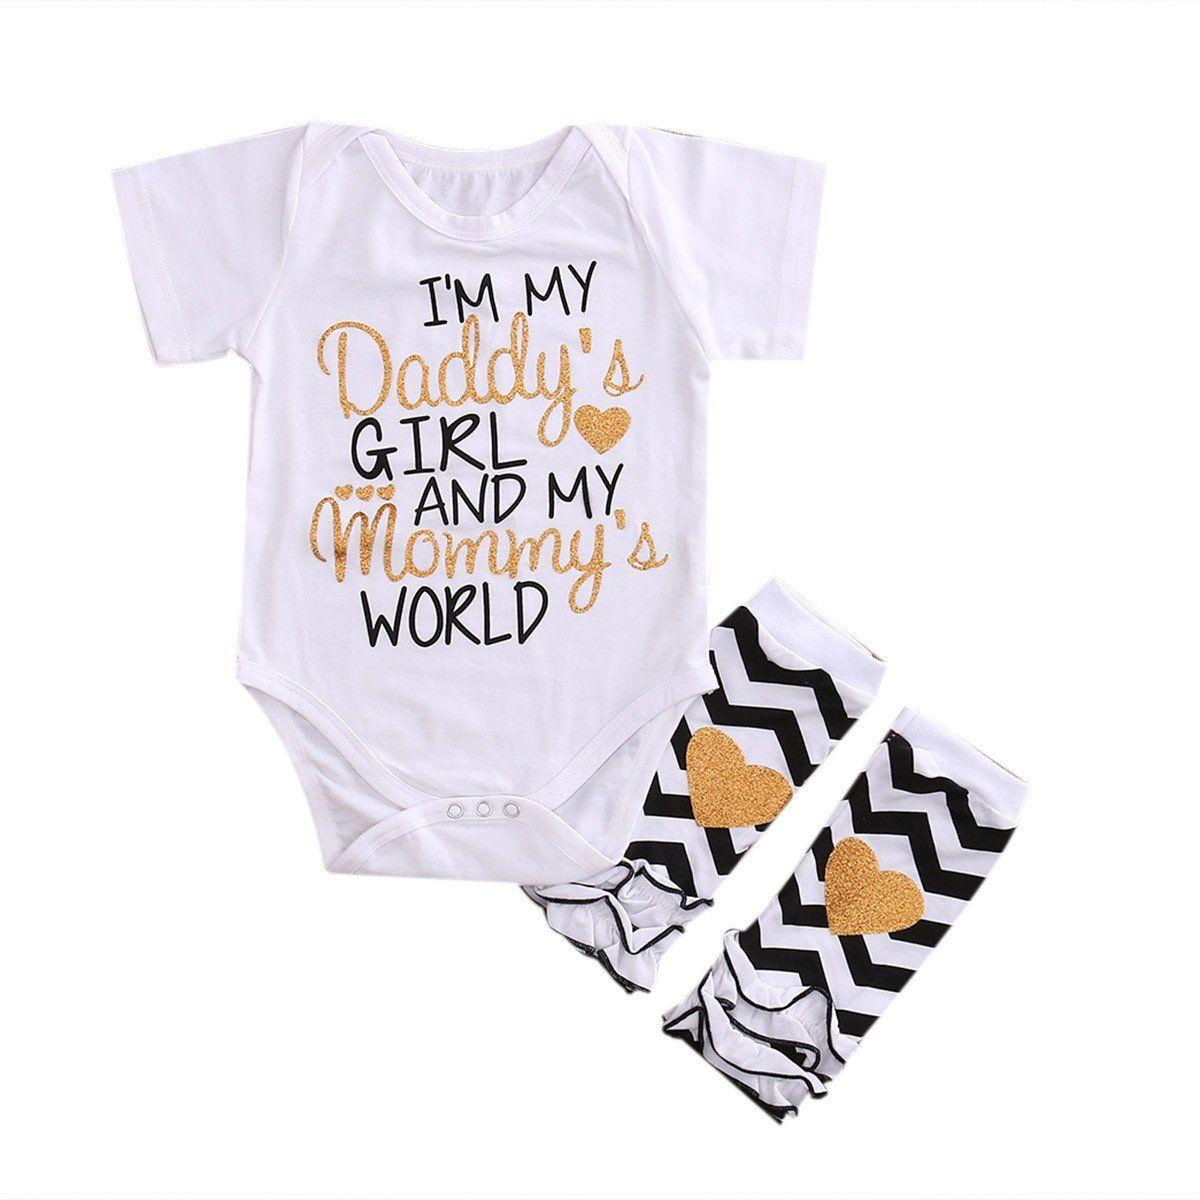 ebaff7c200c I m My Daddy s Girl and My Mommy s World